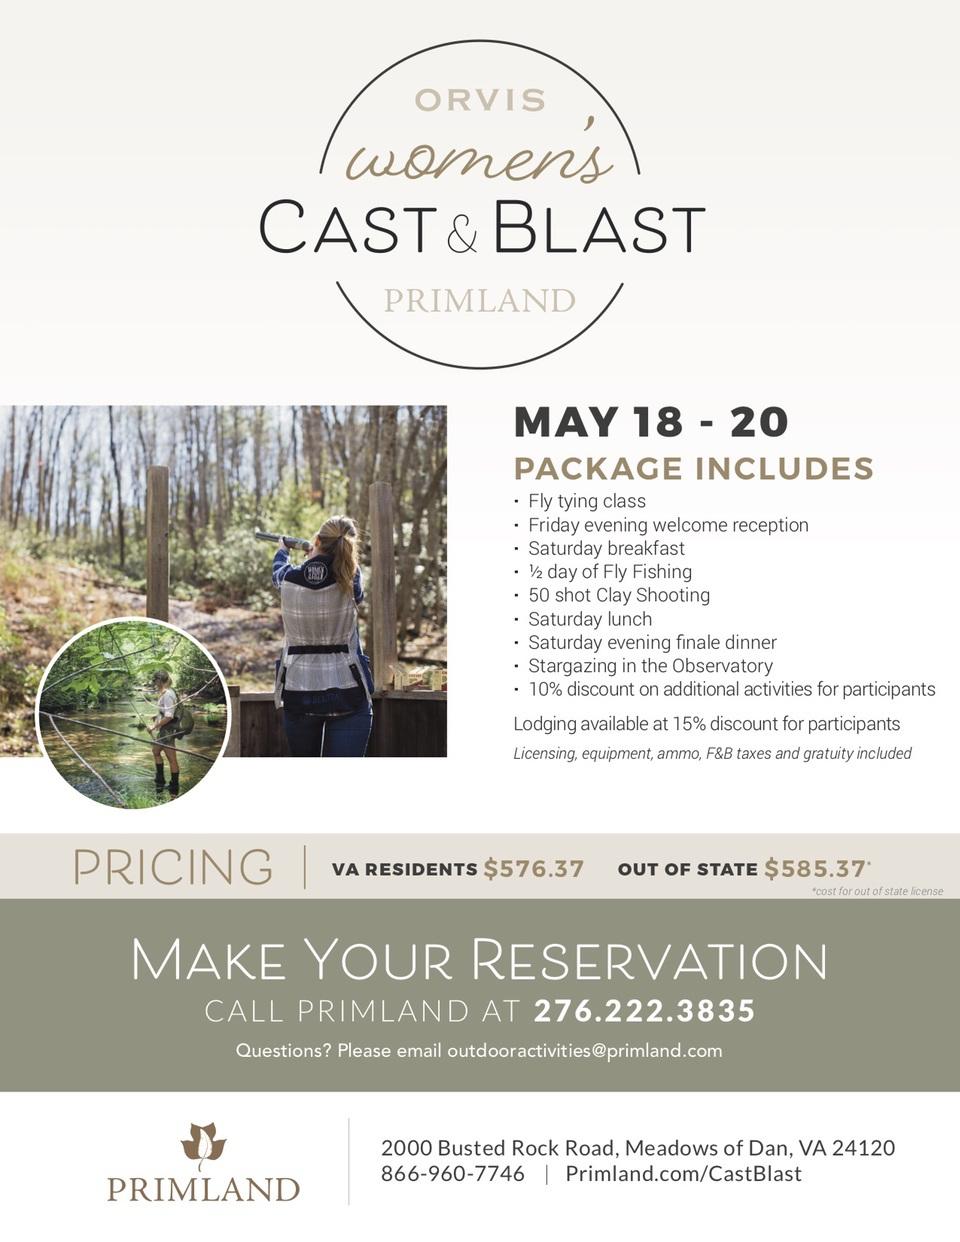 Primland Orvis Cast & Blast flyer, 021618_final